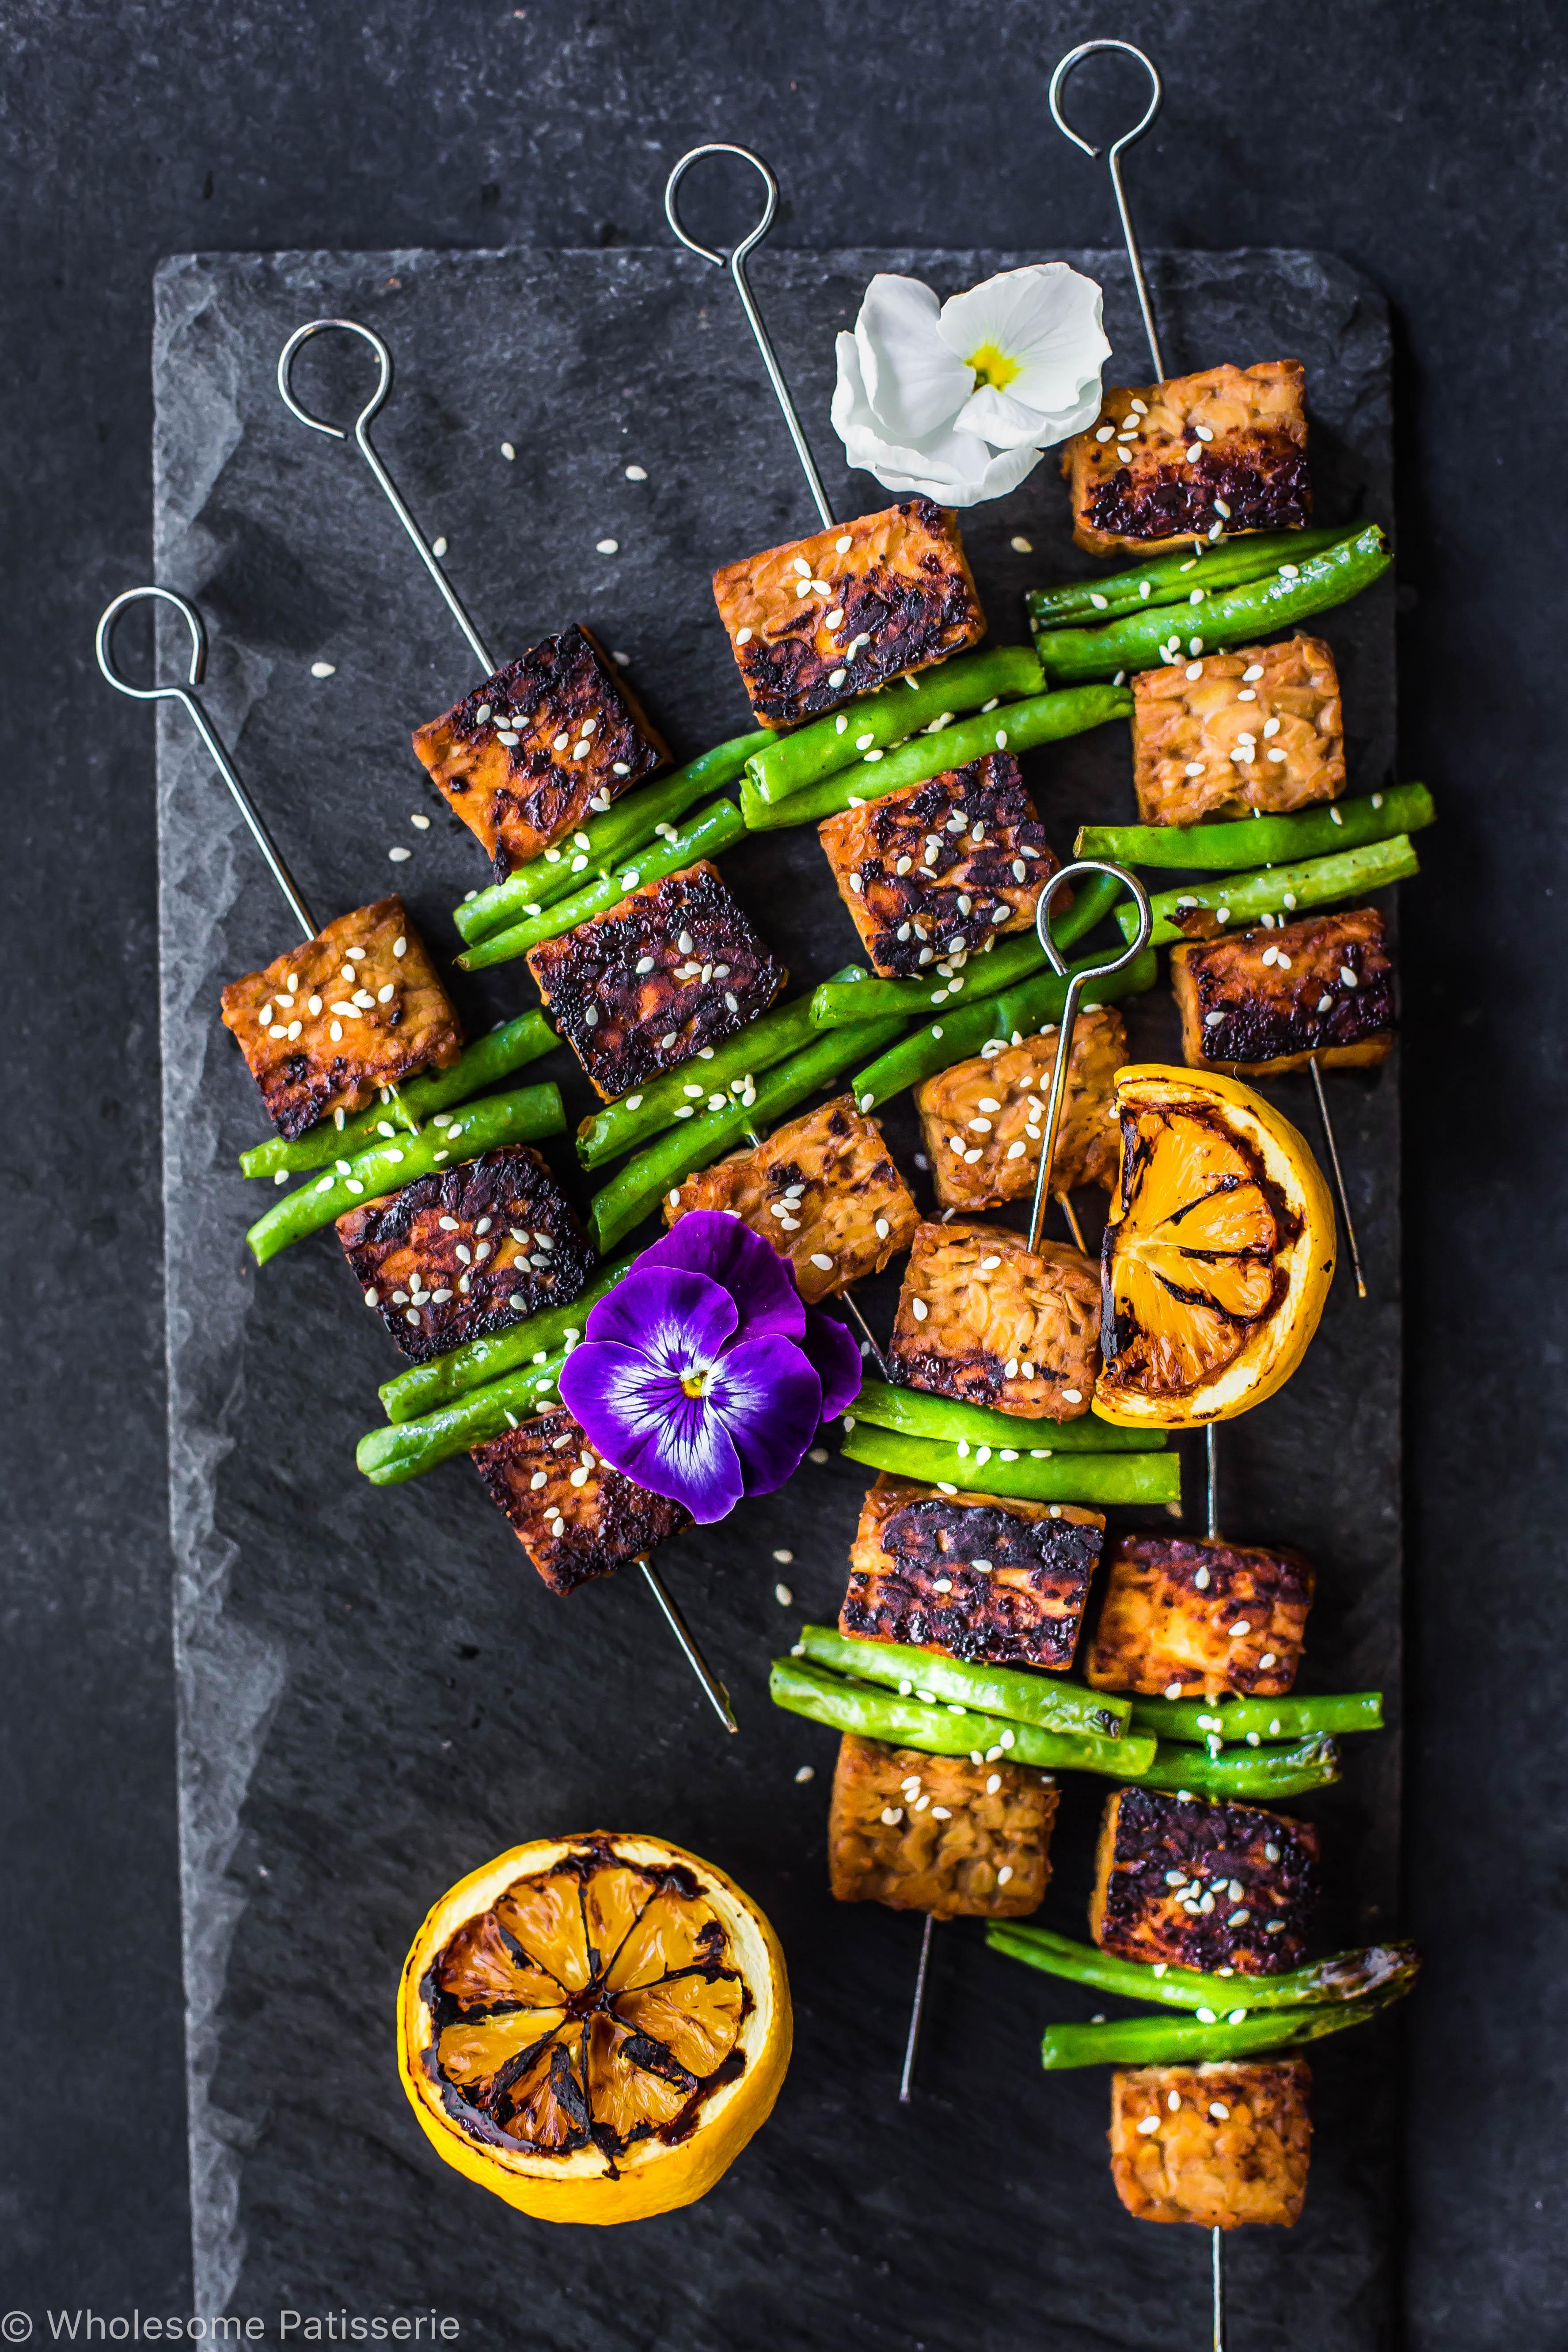 soy-tempeh-skewers-vegan-gluten-free-dinner-easy-marinade-healthy-family-light